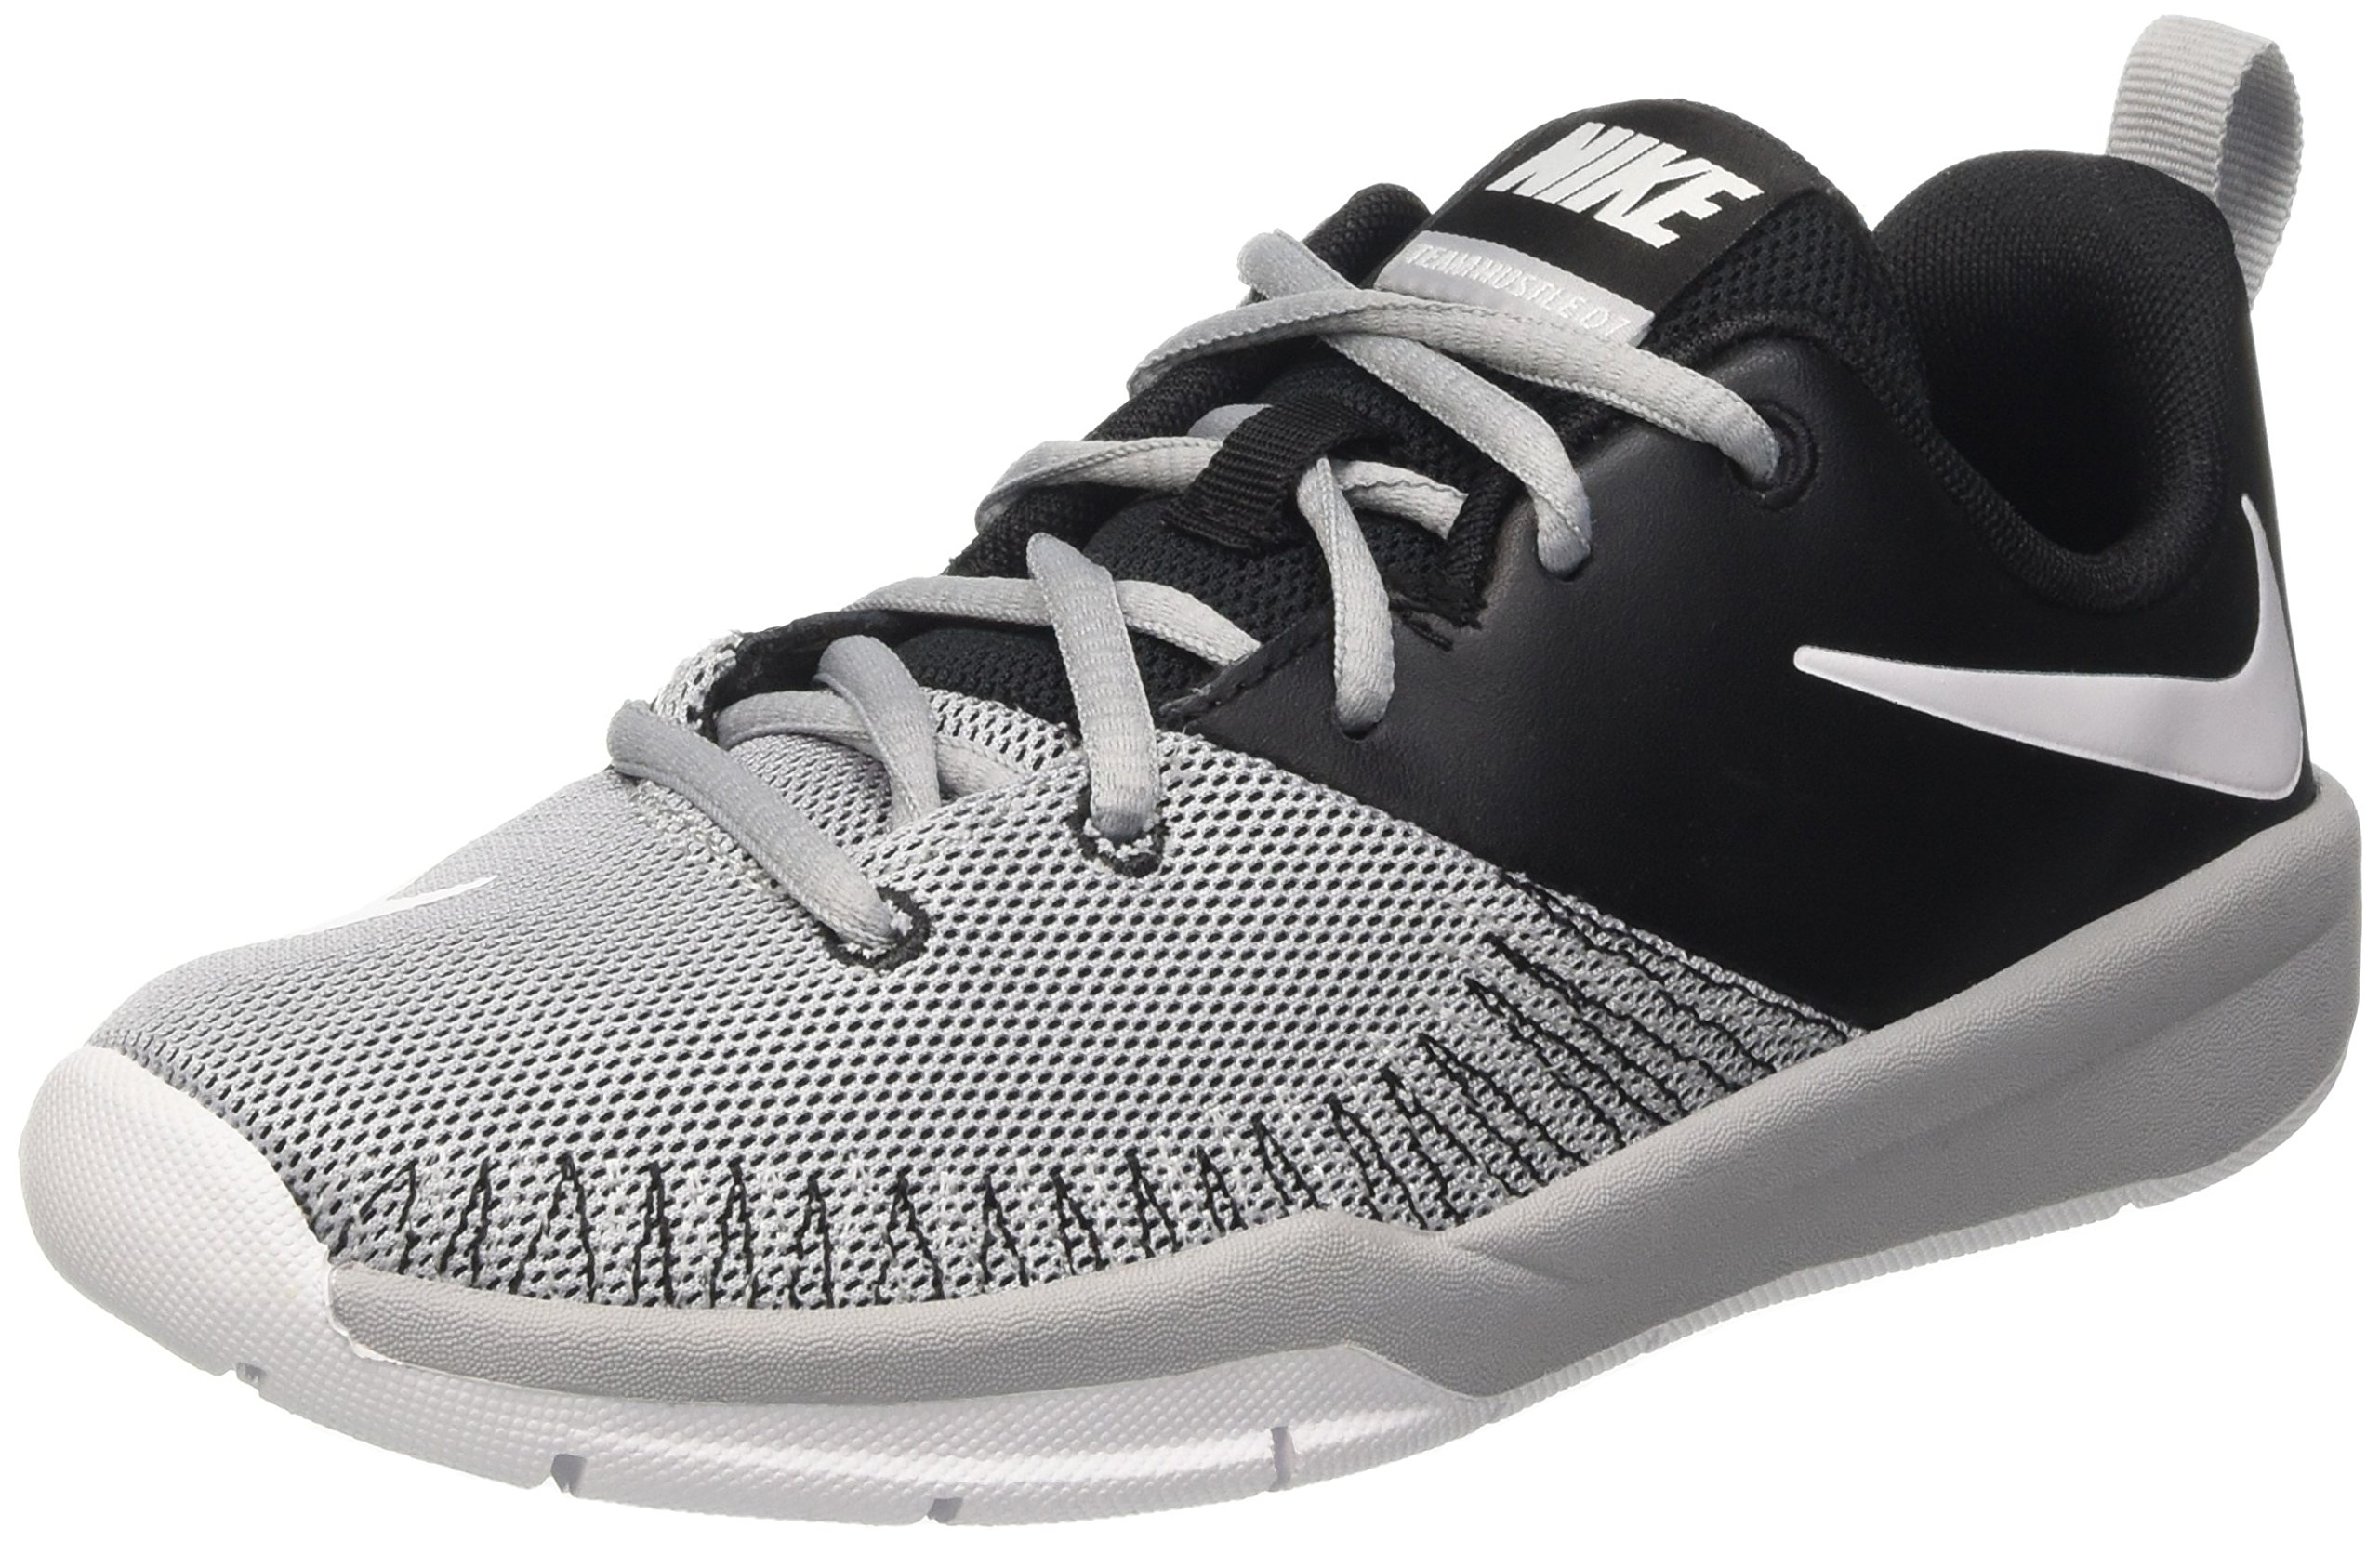 Nike Jordan 410 (Youth) Black/Grey